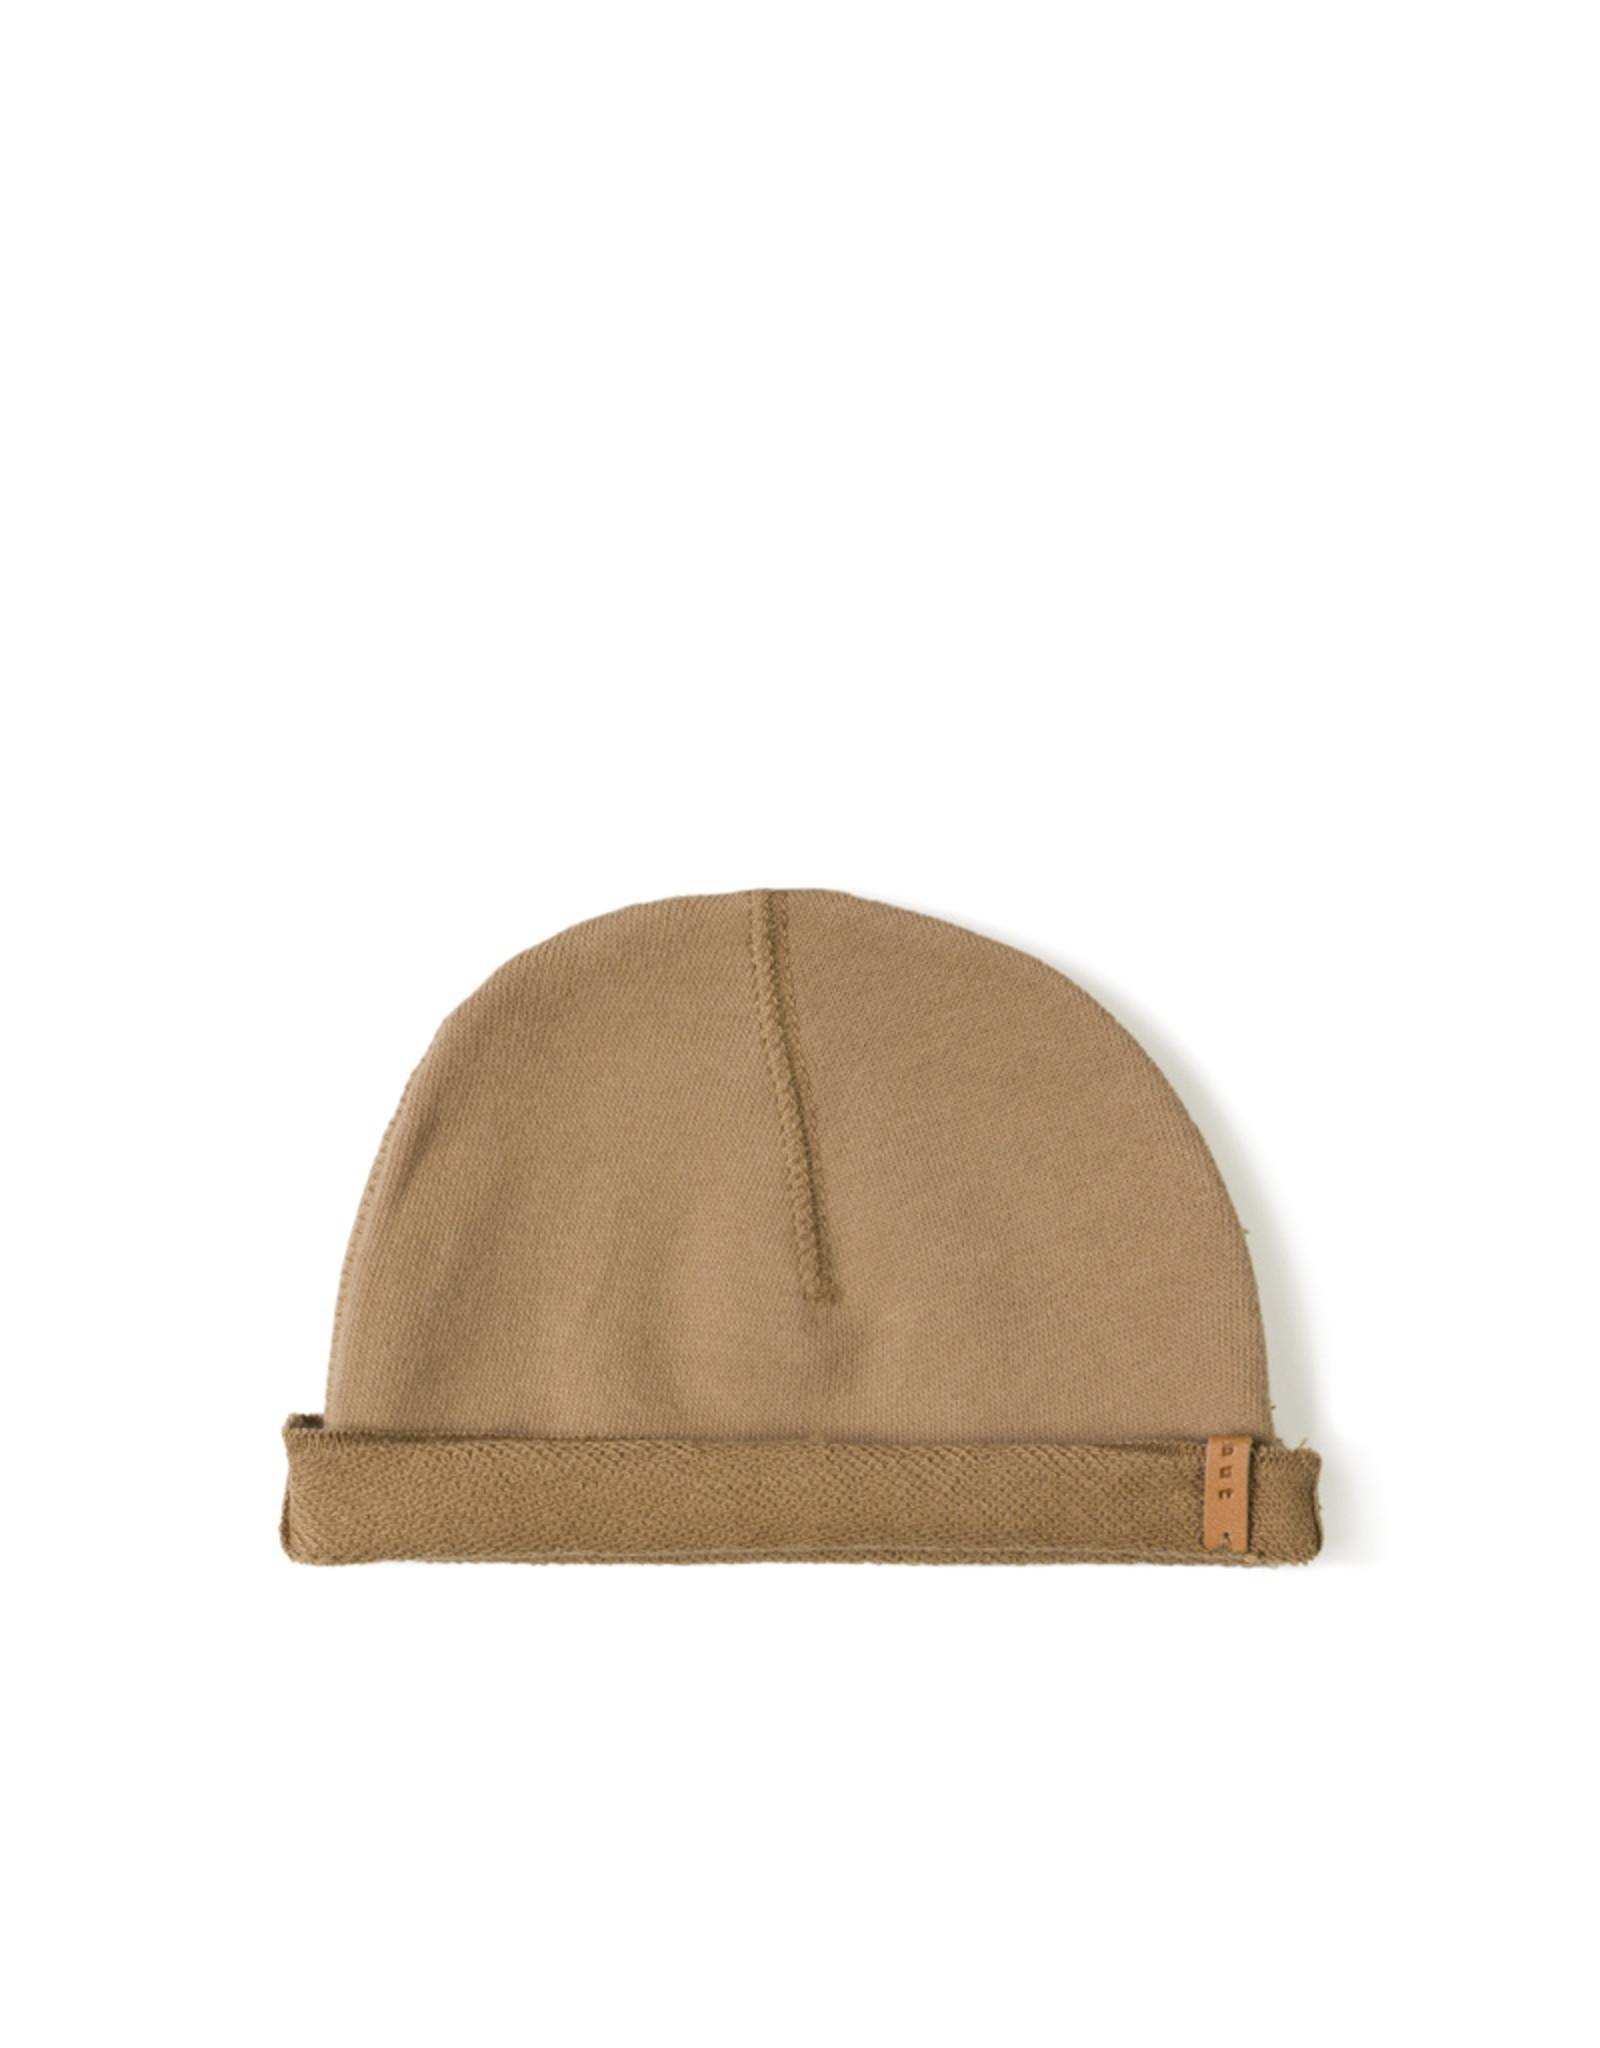 Nixnut Bonnet - toffee uni